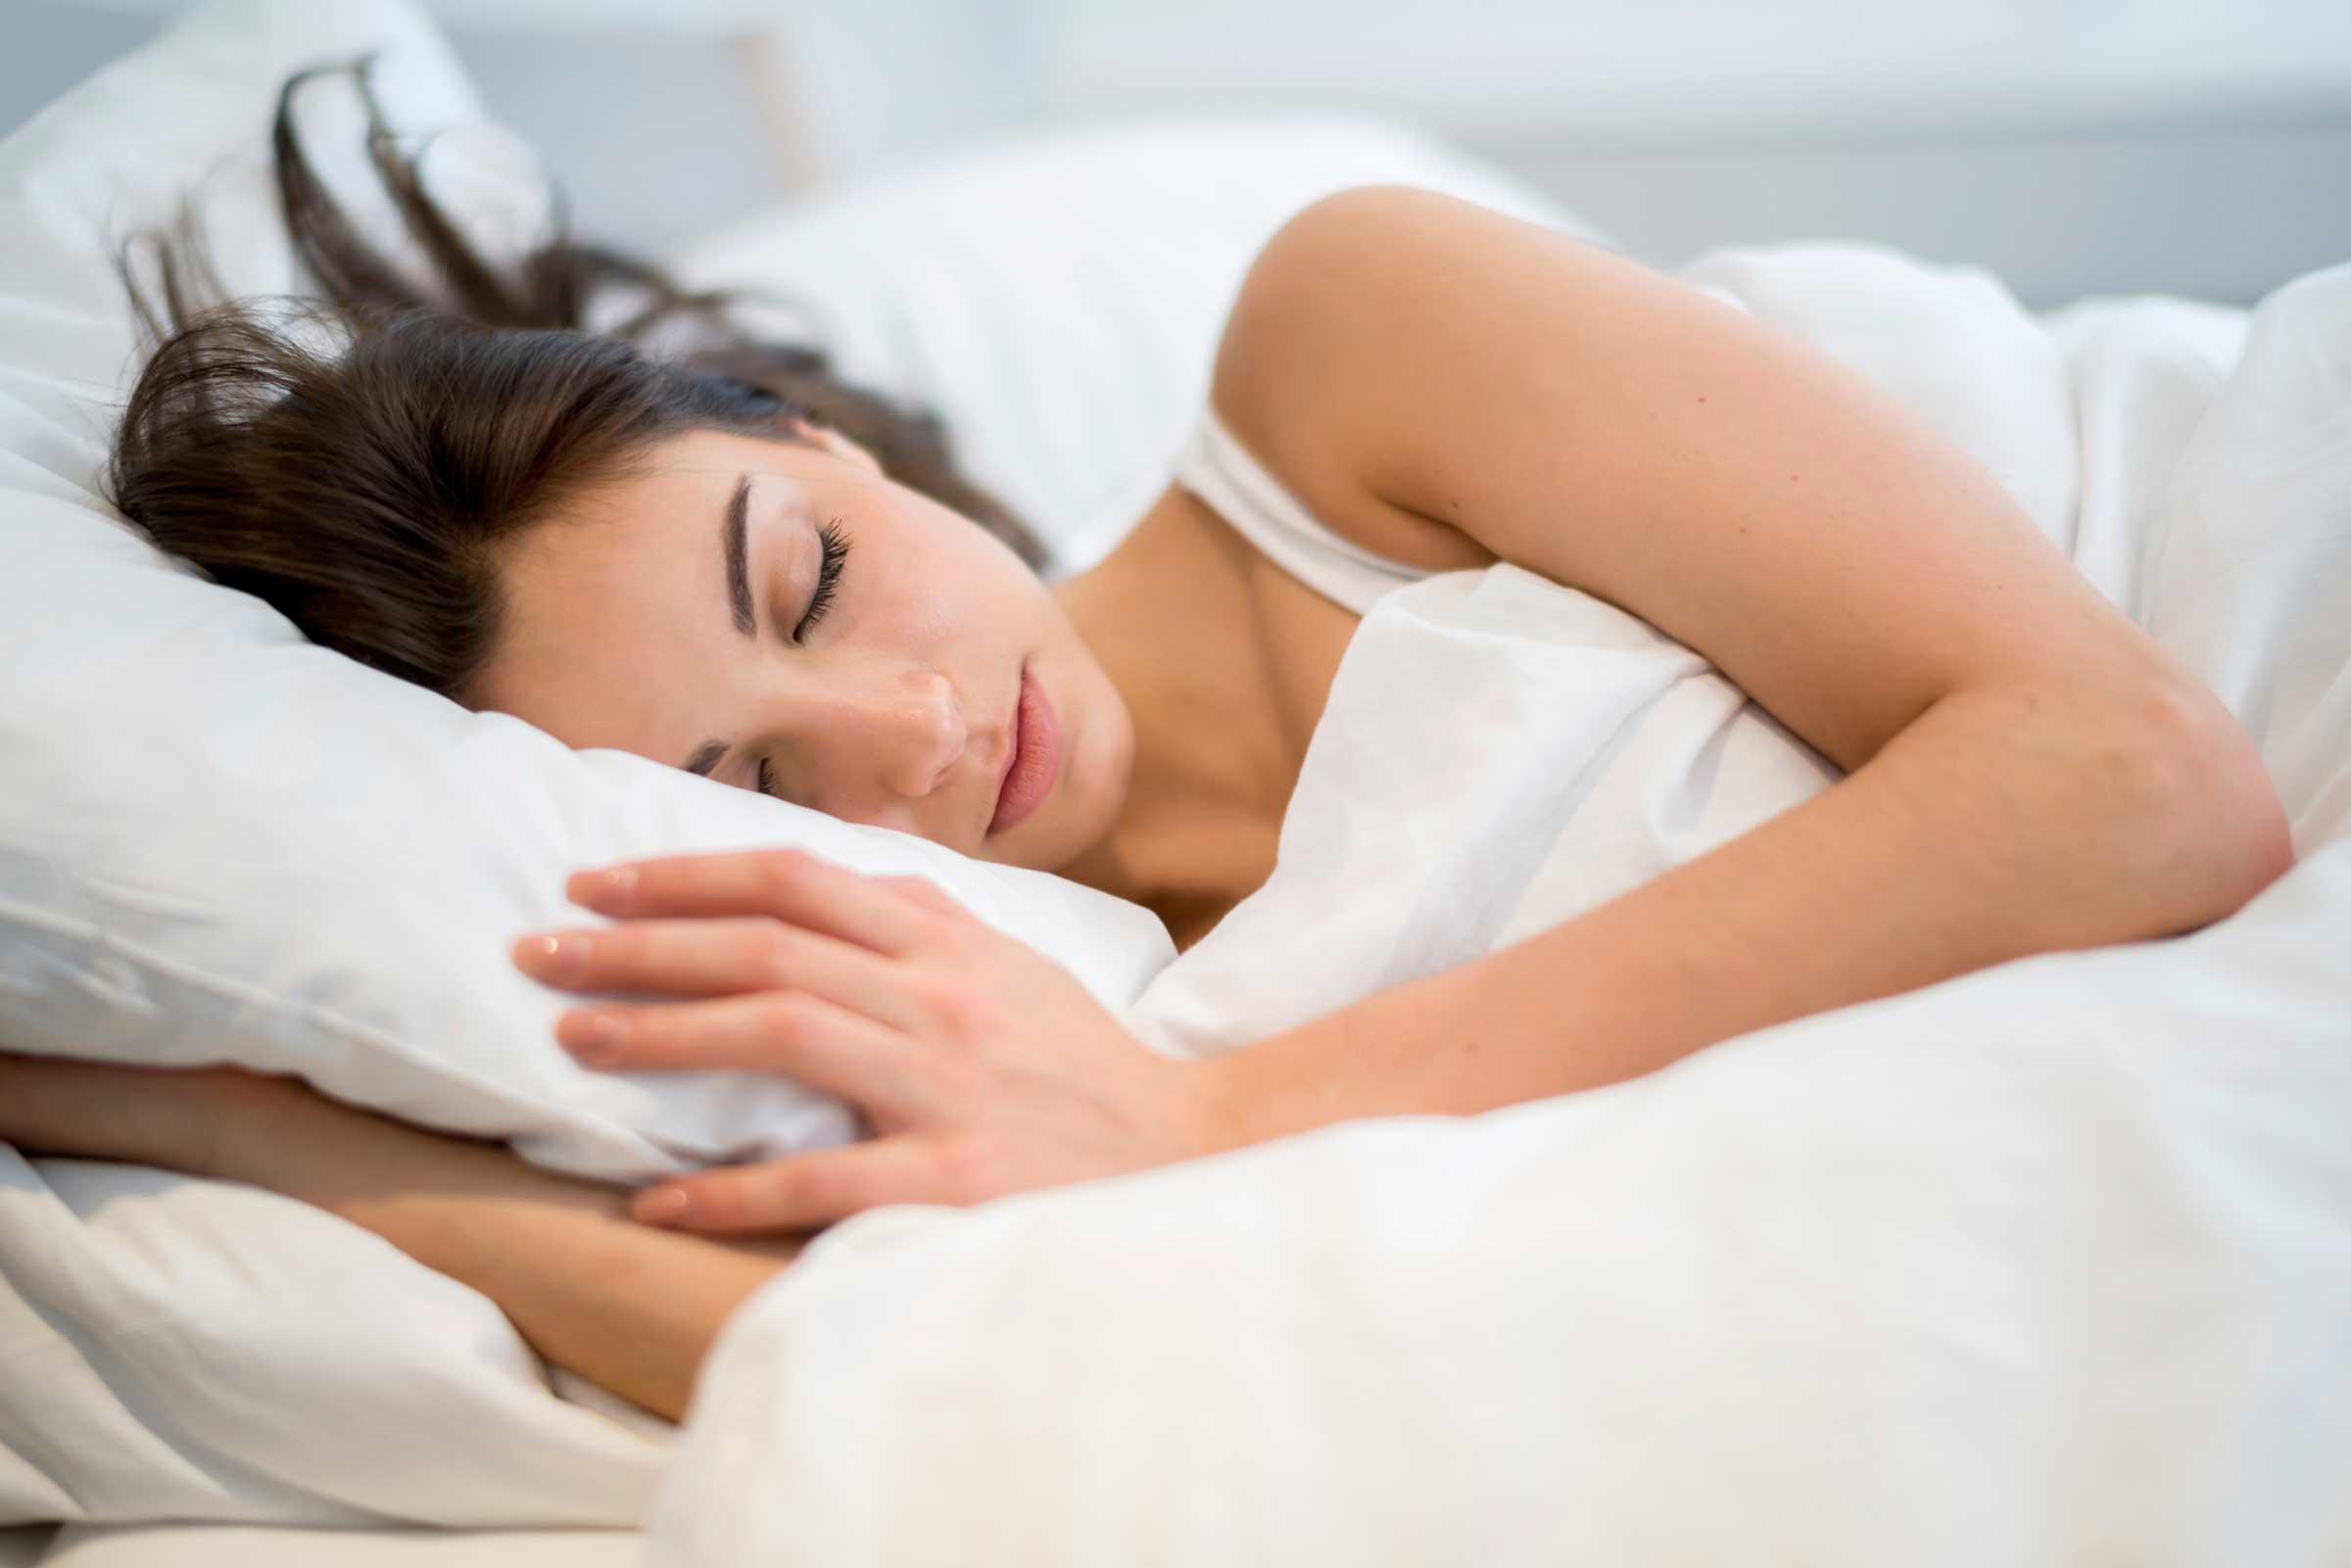 C:\Users\Sophia\AppData\Local\Microsoft\Windows\INetCache\Content.Word\02-bad-habits-insomnia-sleep-too-early.jpg